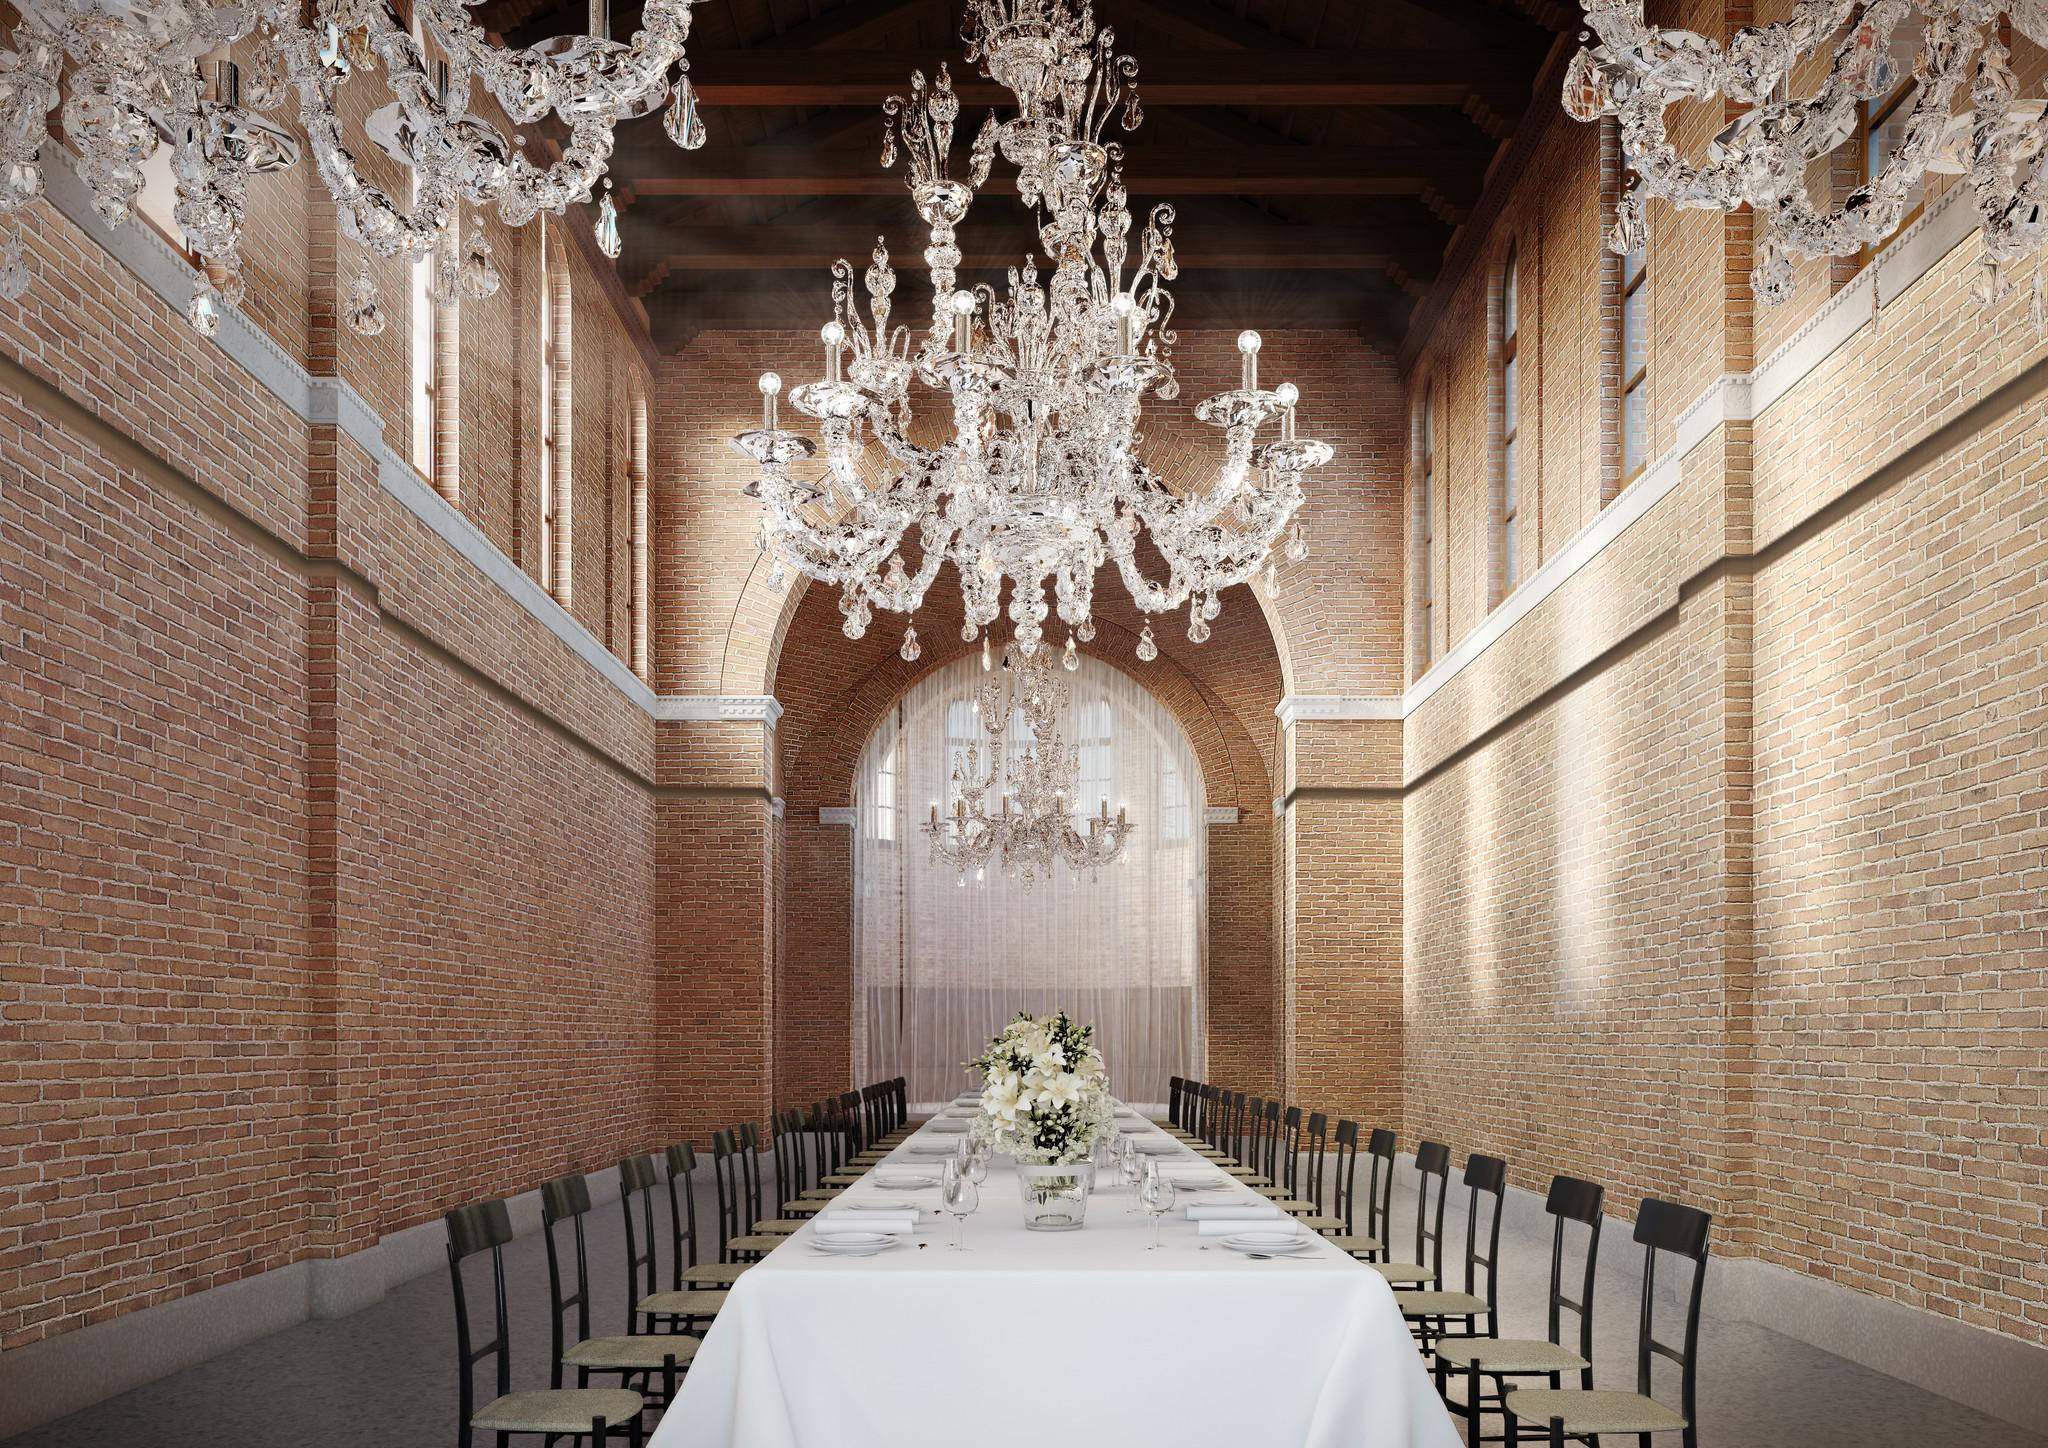 Italy: Plush new JW Marriott island resort in Venice opens early